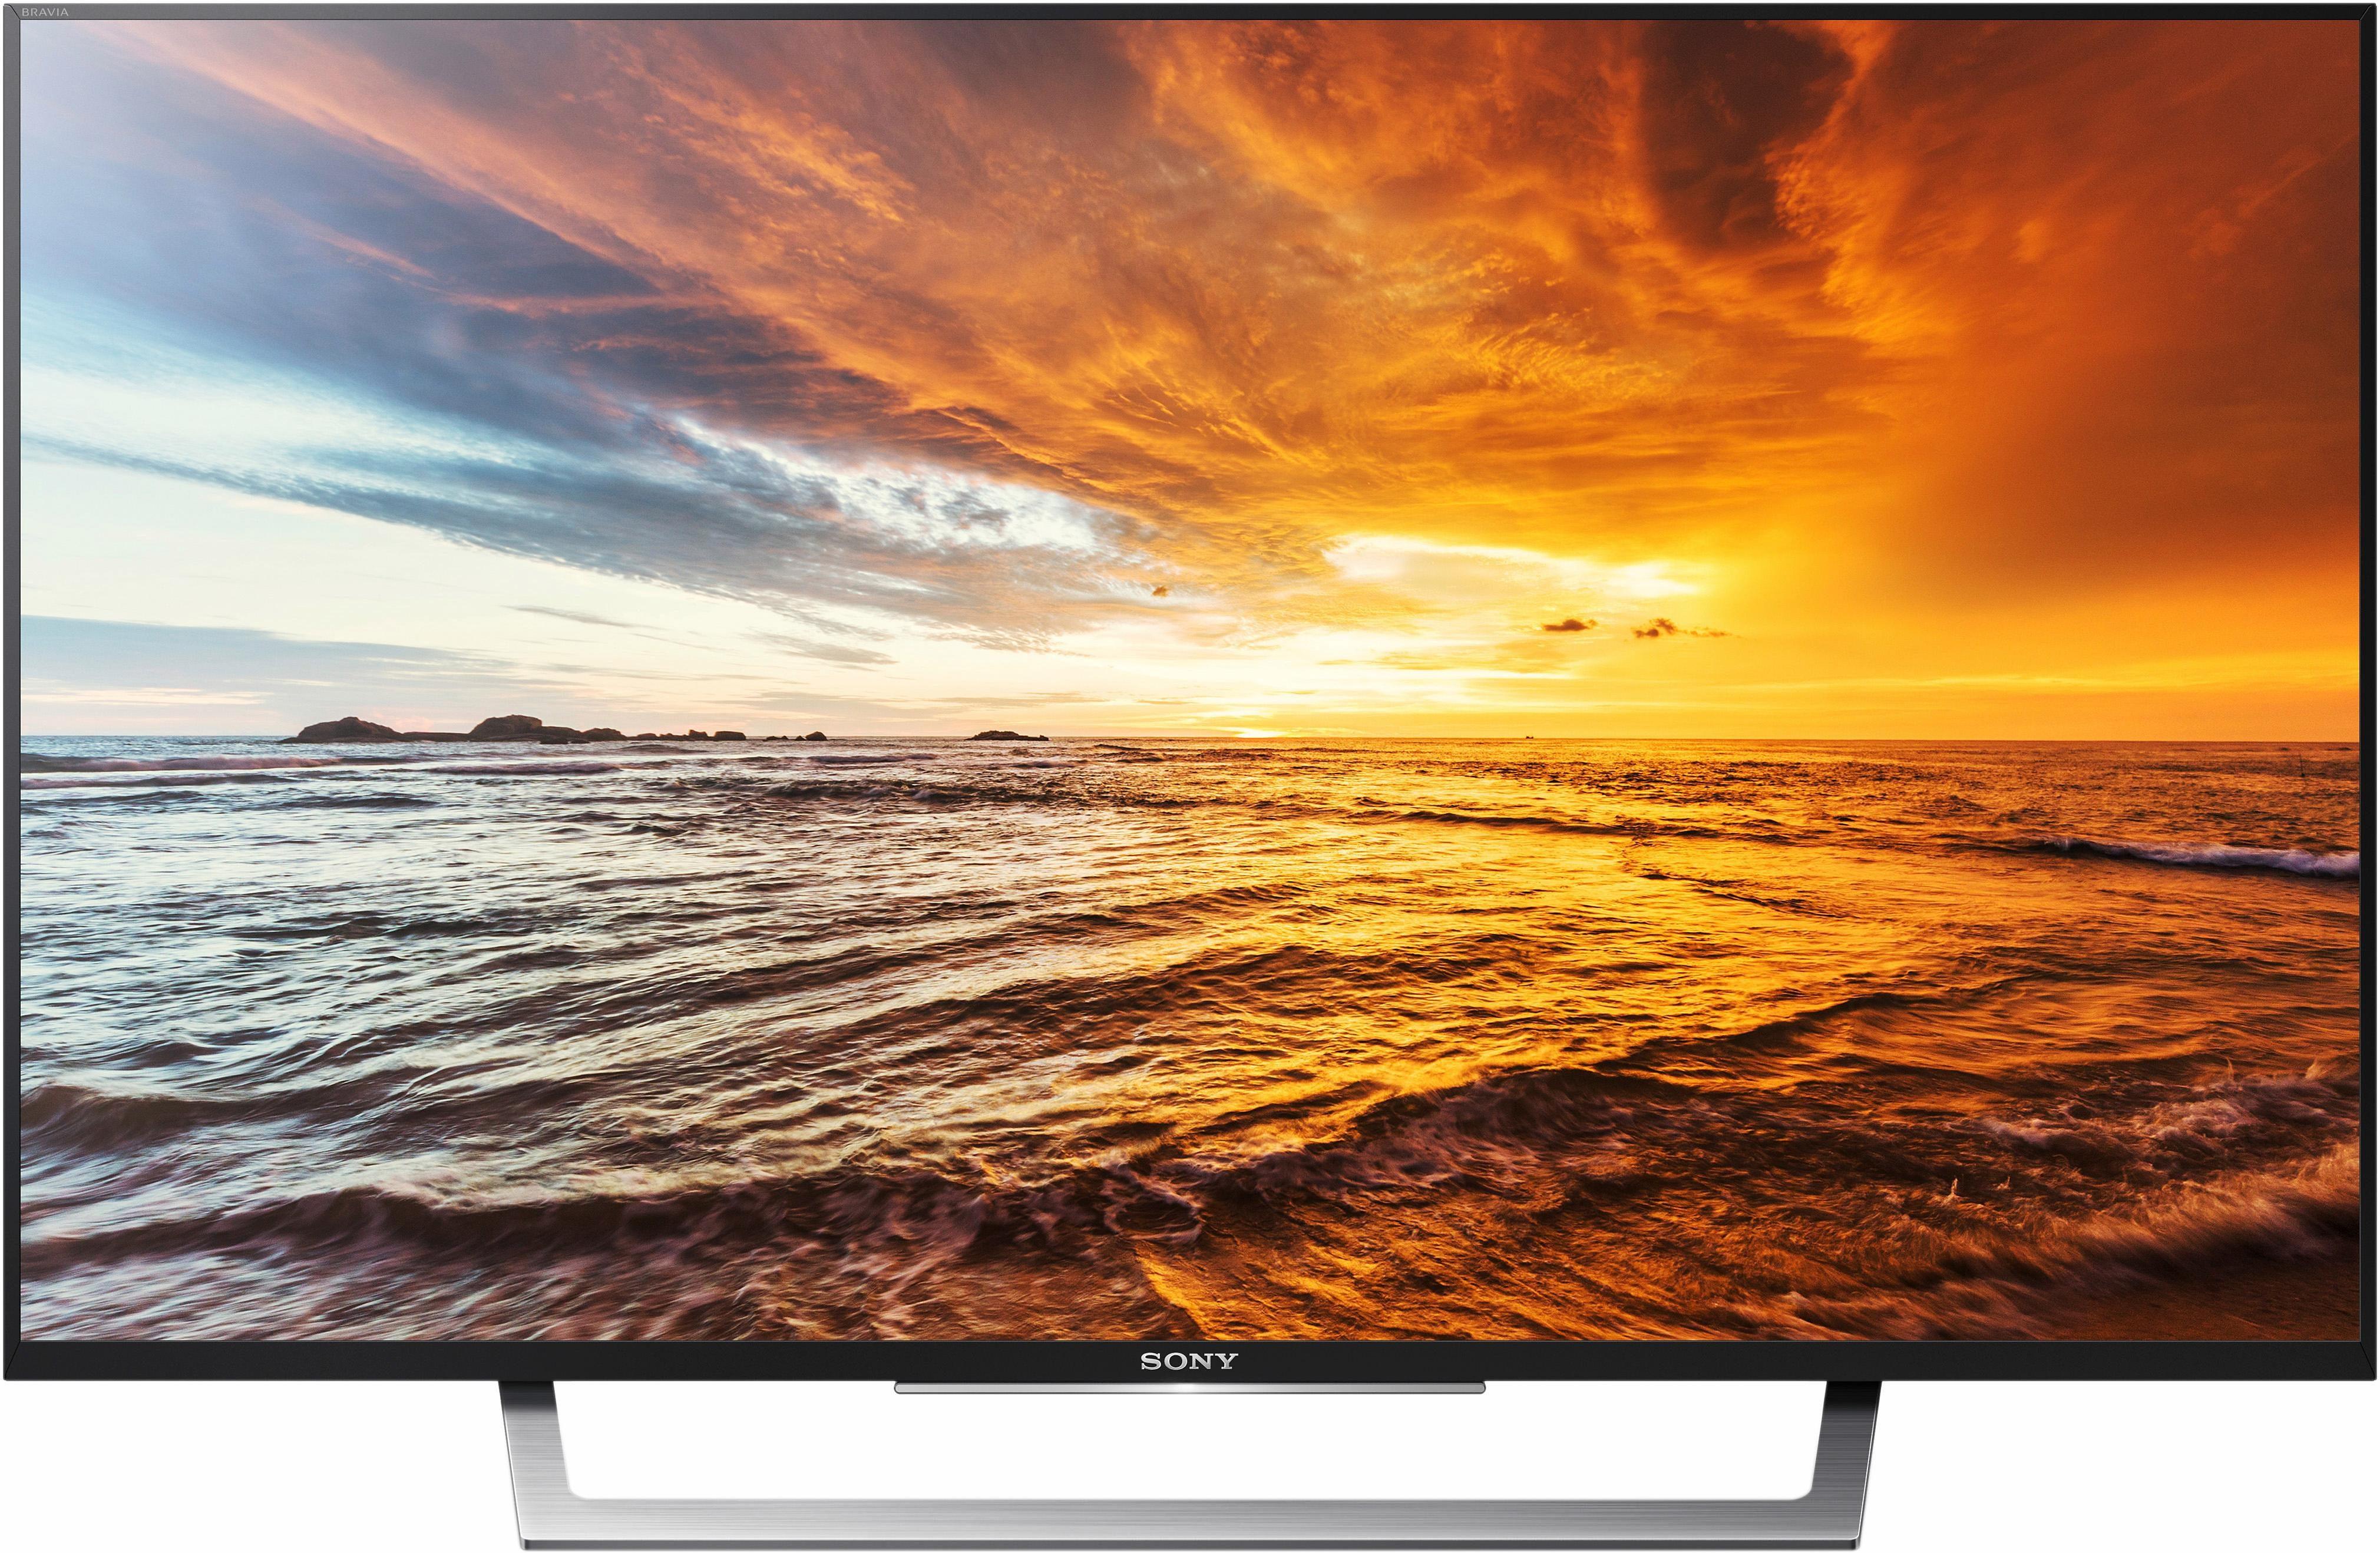 Sony KDL-43WD755, LED Fernseher, 108 cm (43 Zoll), 1080p (Full HD), Smart-TV